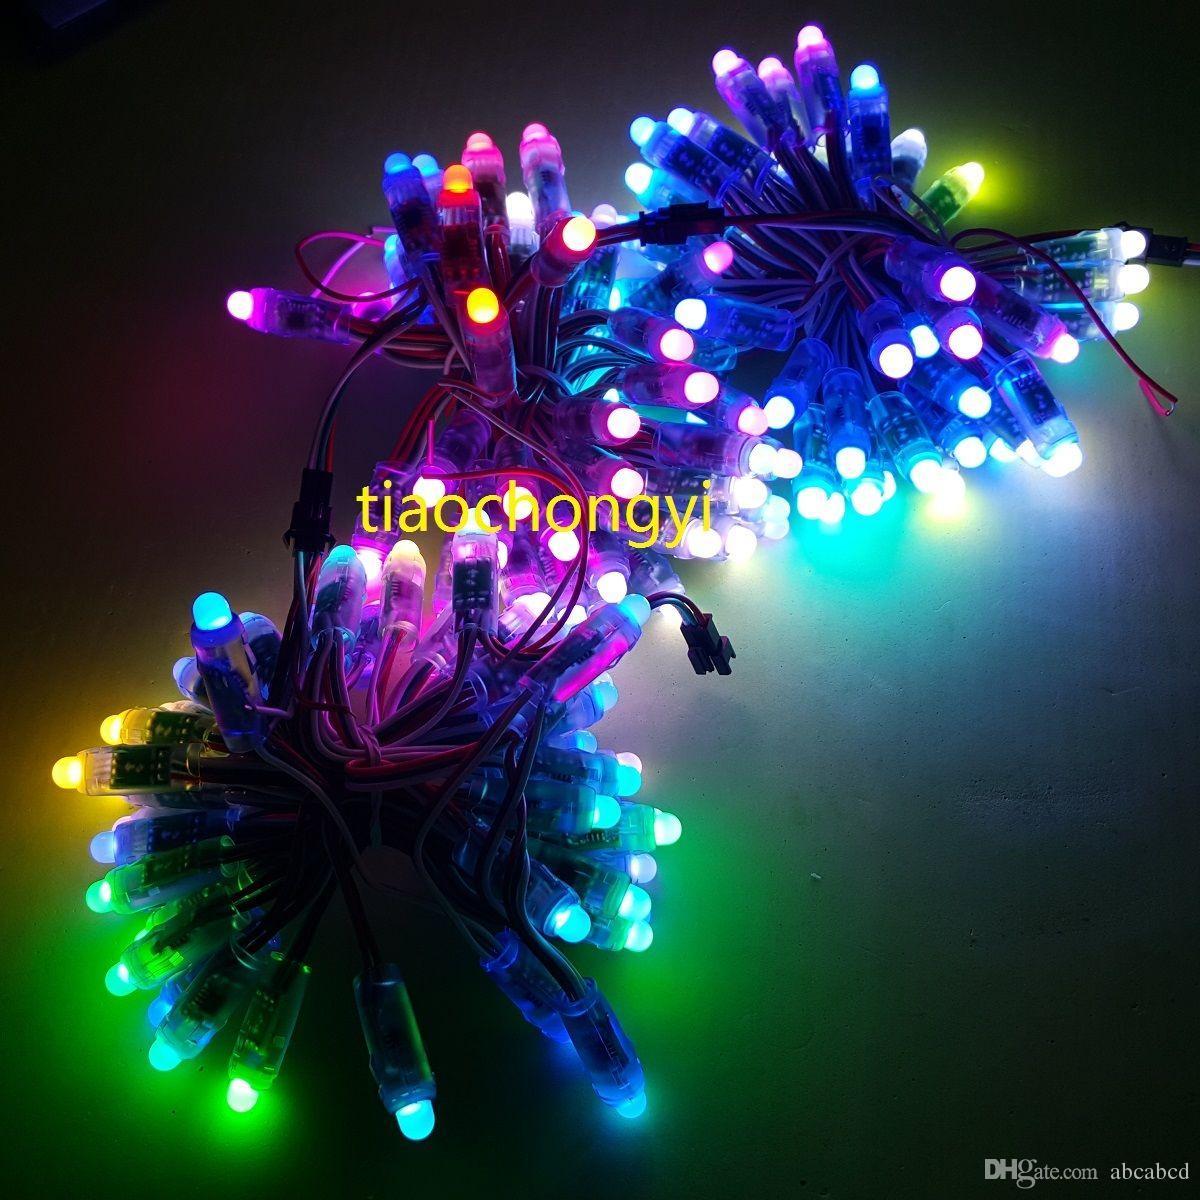 50PCS WS2811 RGB farbenreiche 12mm Pixel digital adressierbare LED Schnur DC 5V